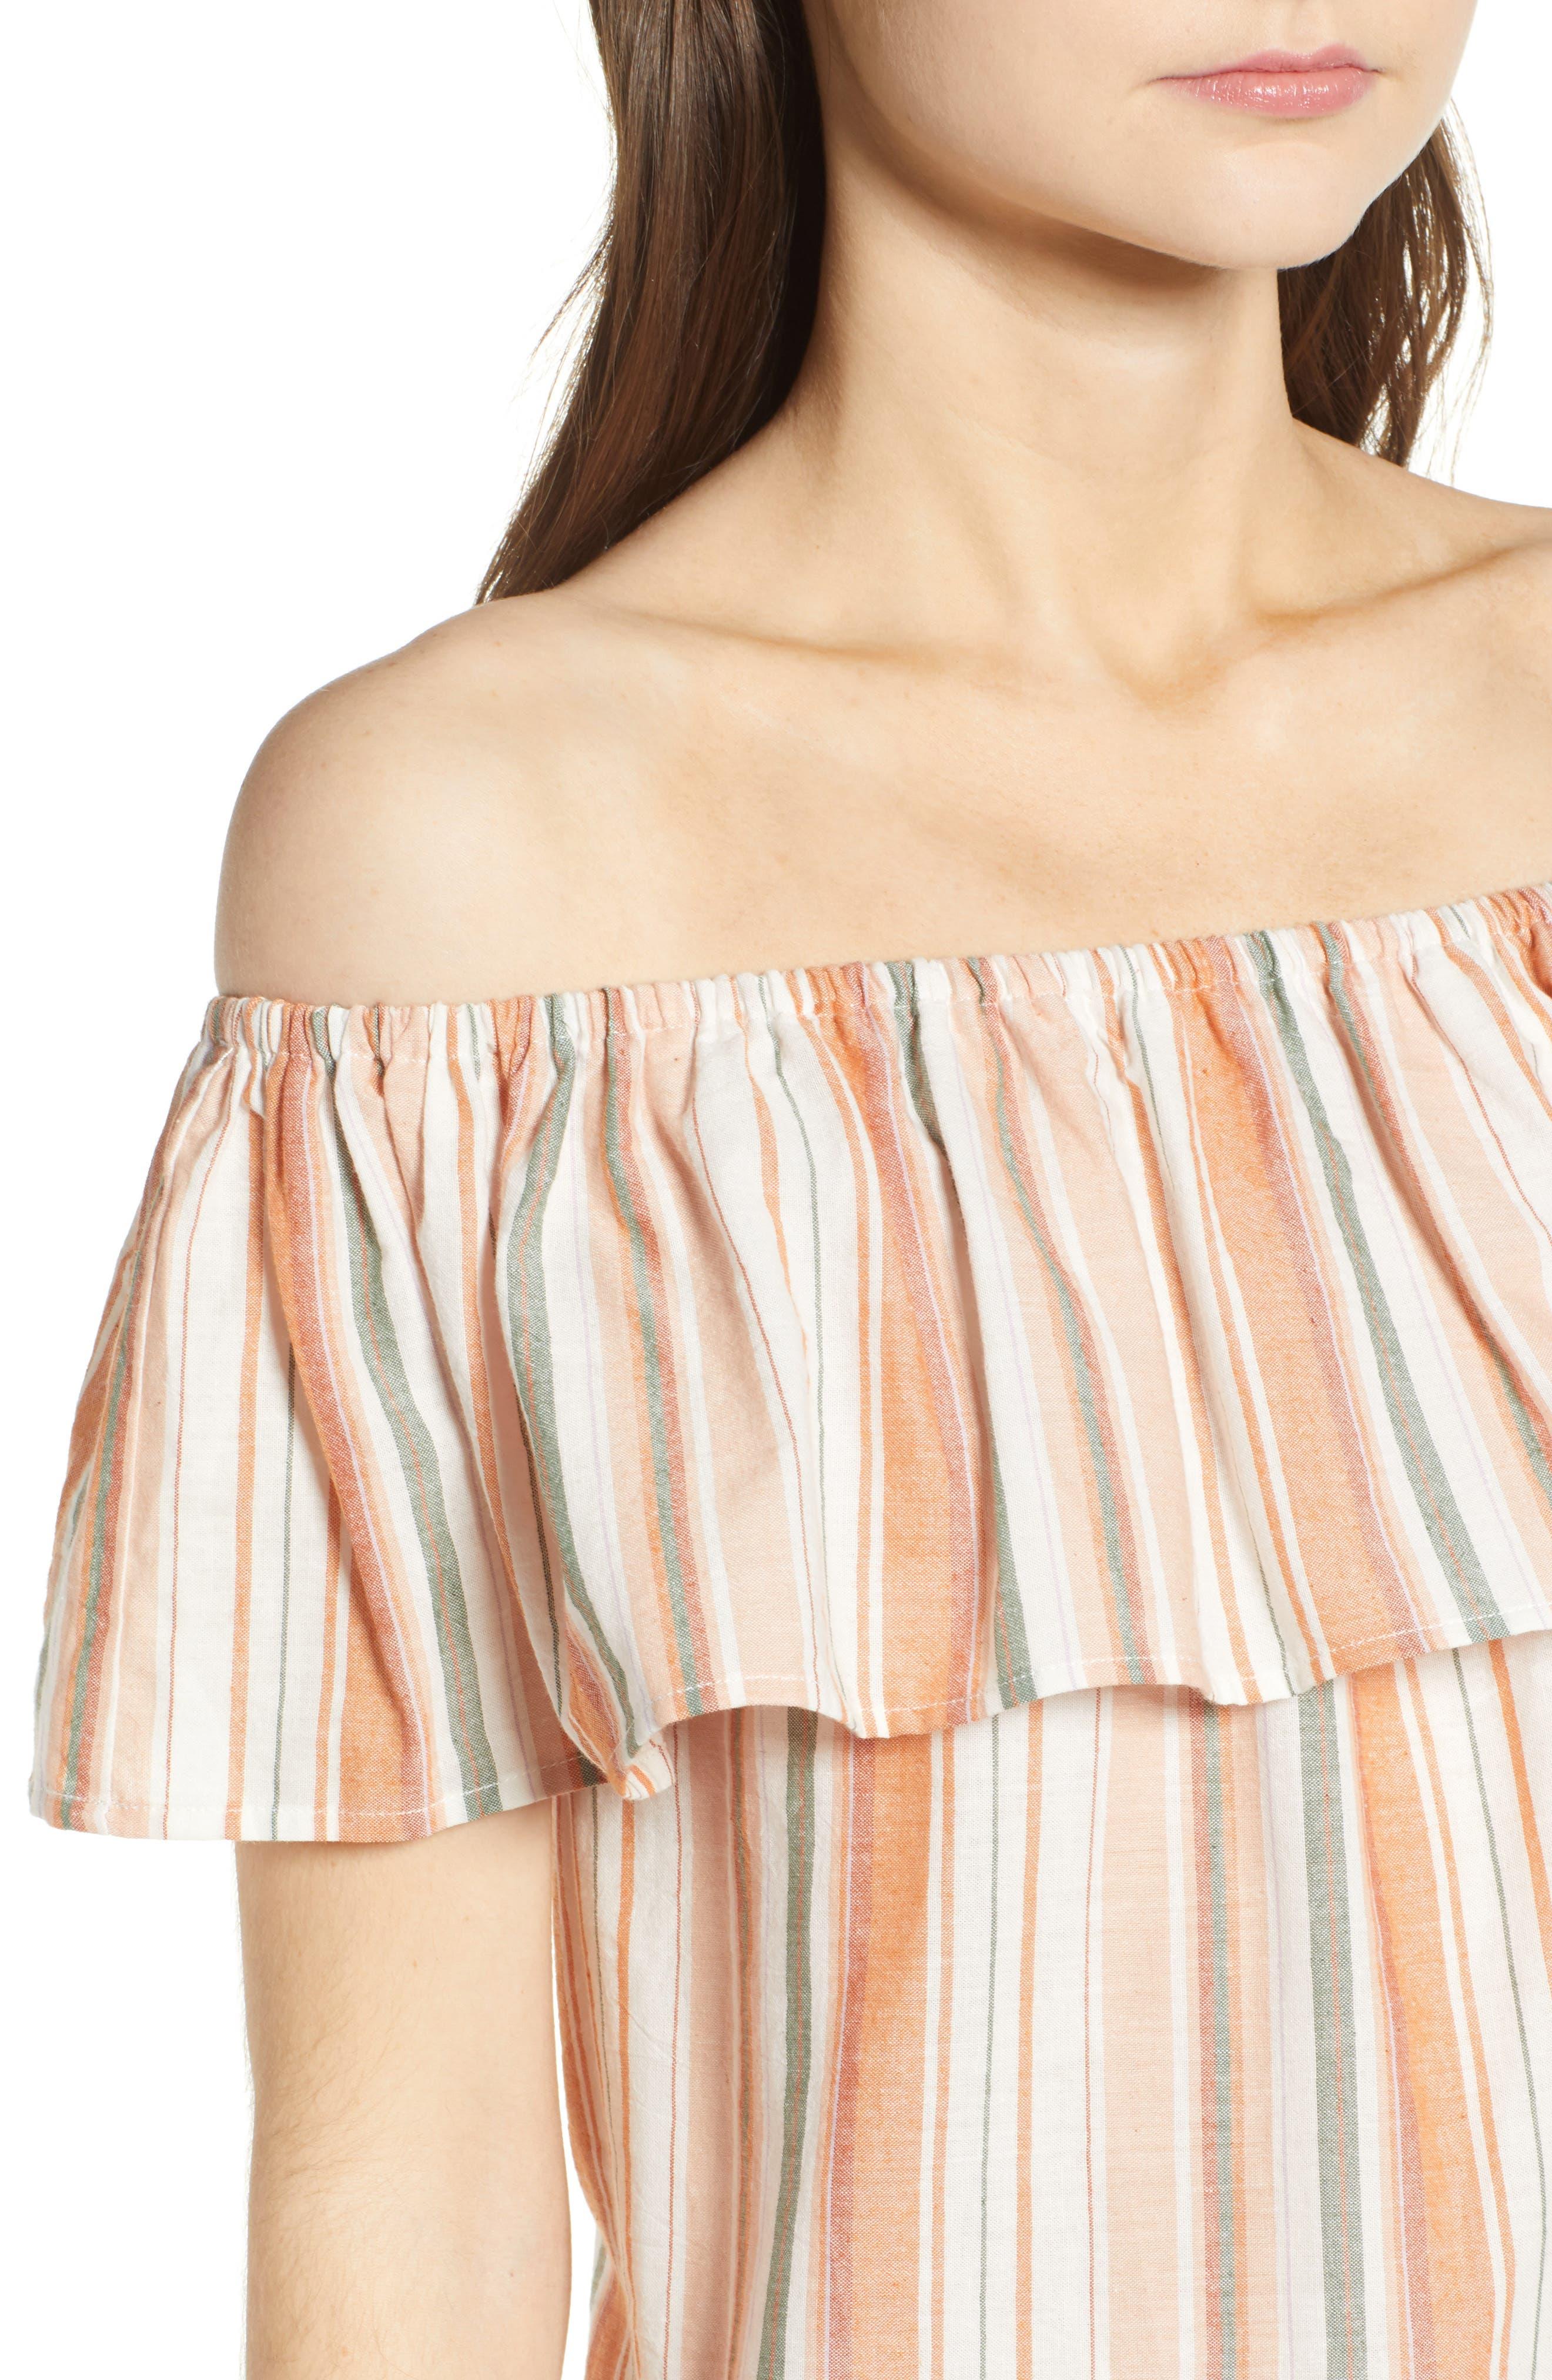 Bishop + Young Sunset Stripe Off the Shoulder Dress,                             Alternate thumbnail 4, color,                             Orange White Stripe